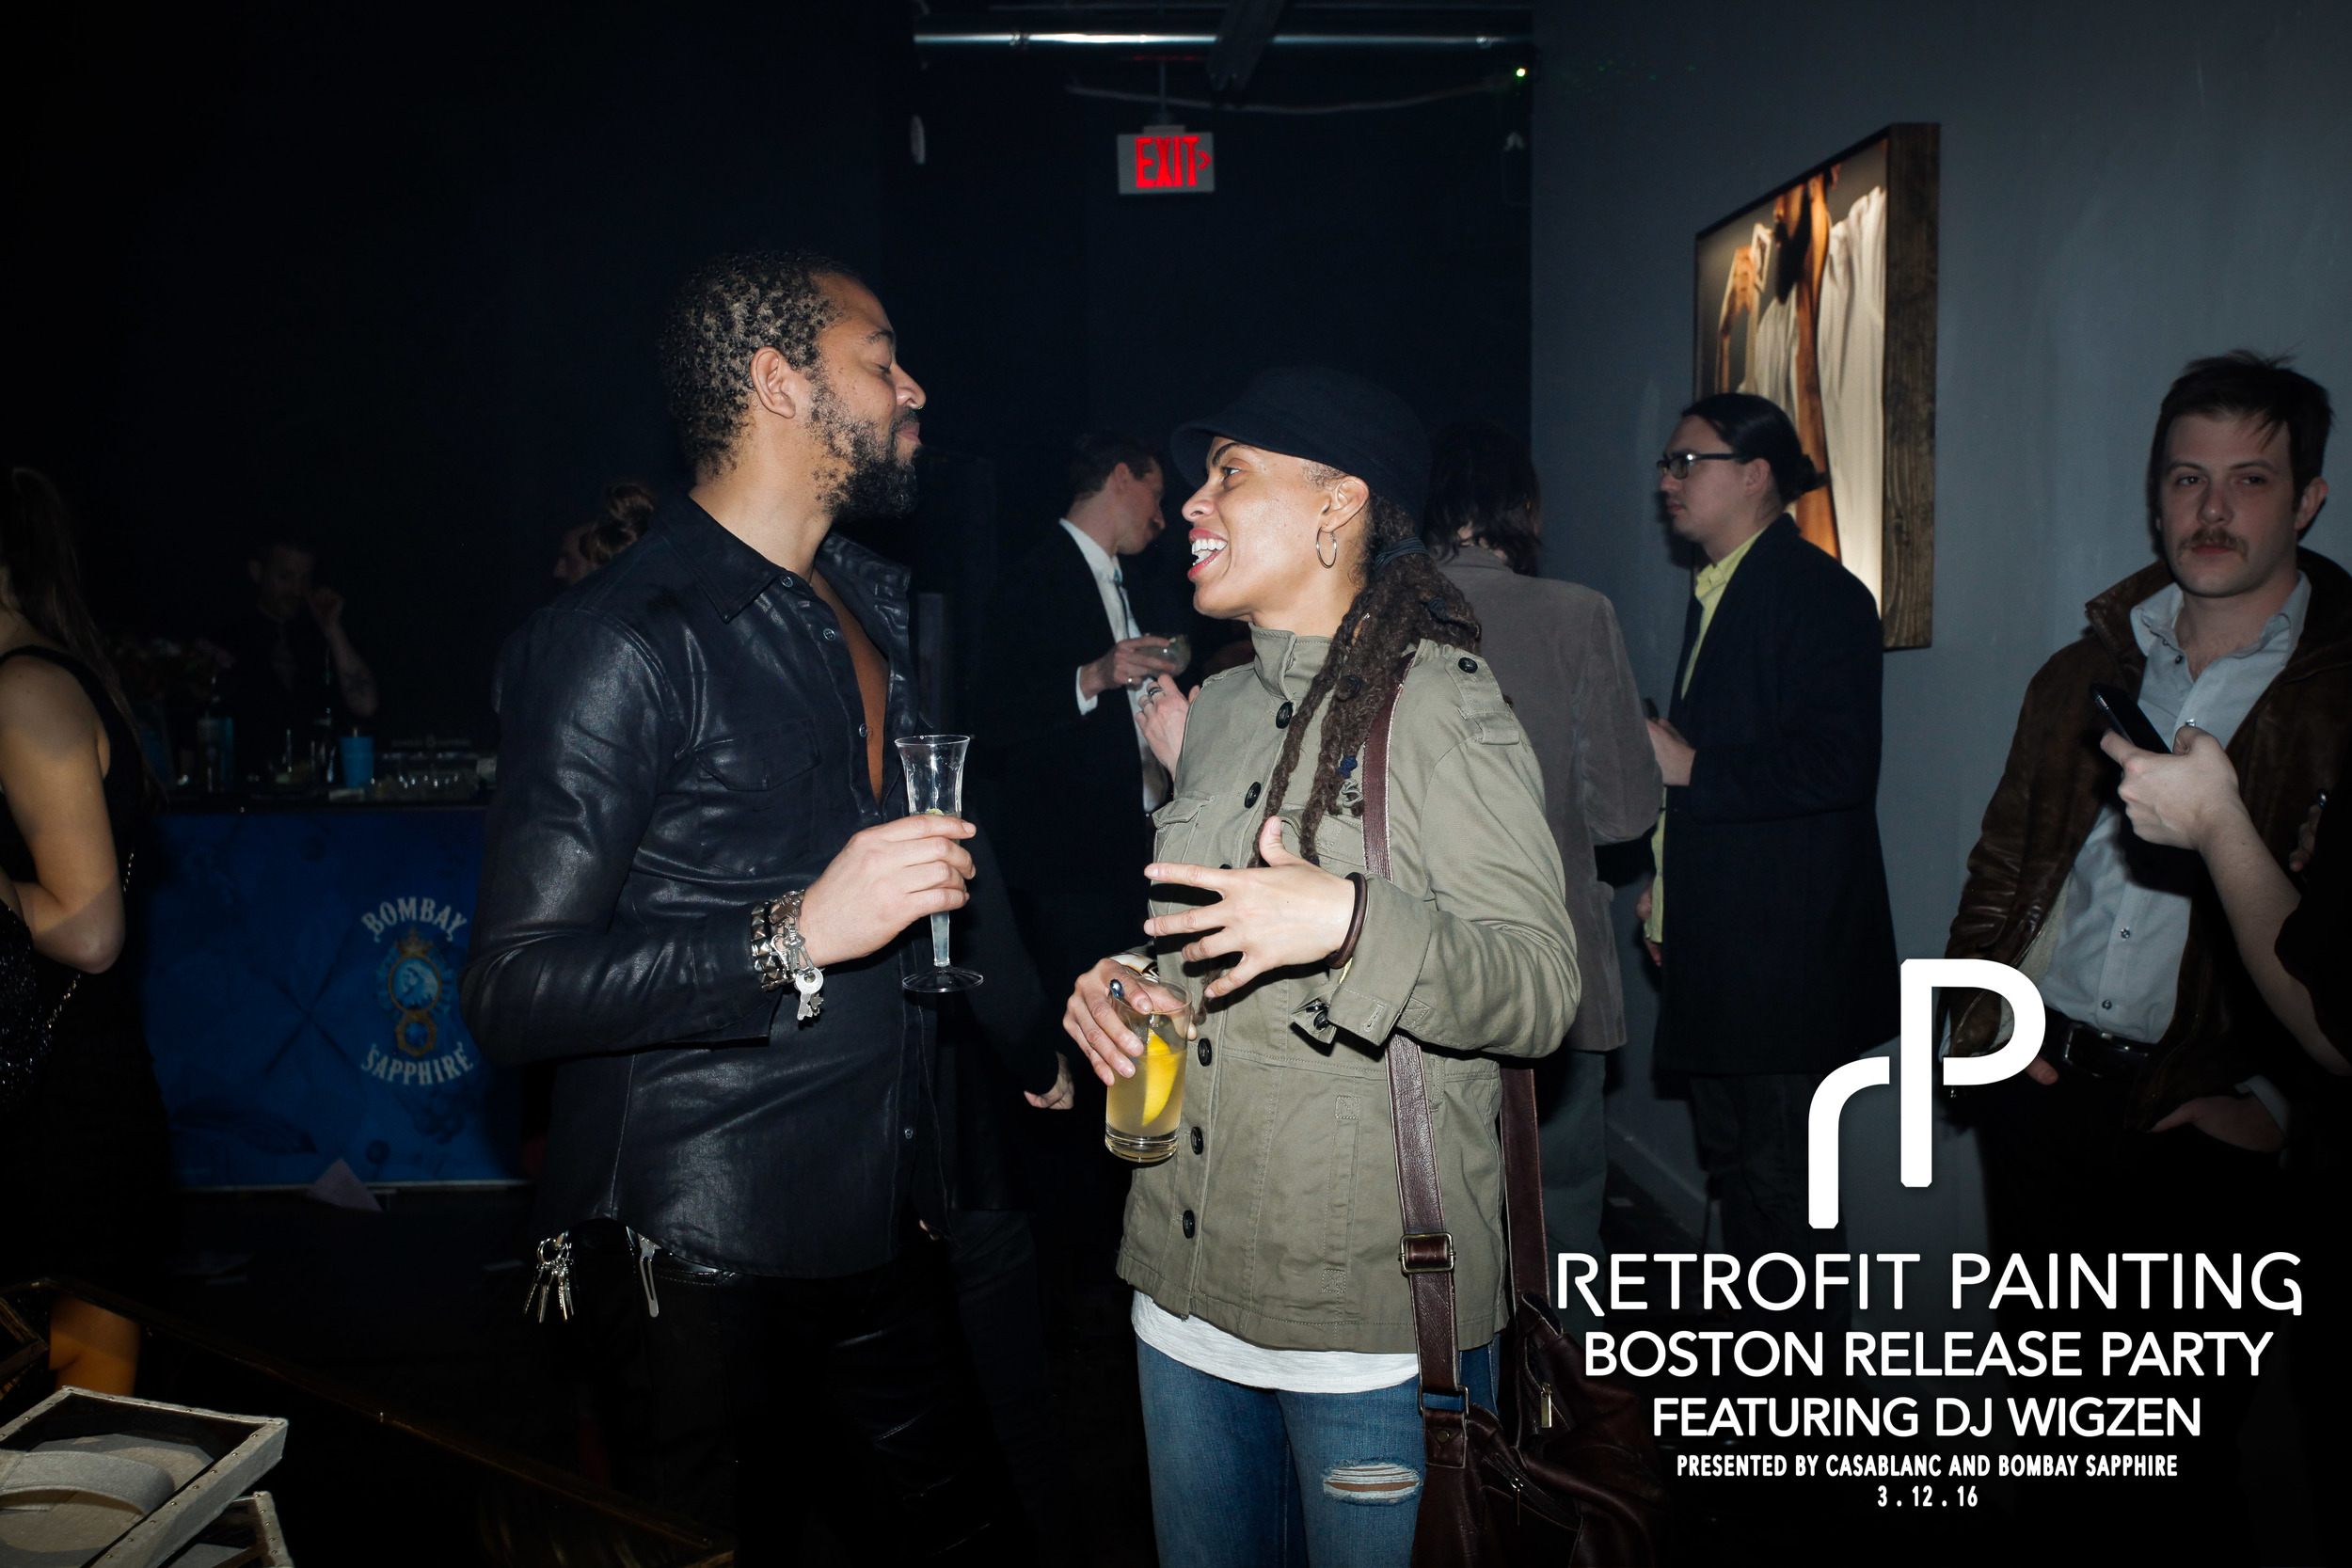 Retrofit Painting Boston Release Party 0104.jpg